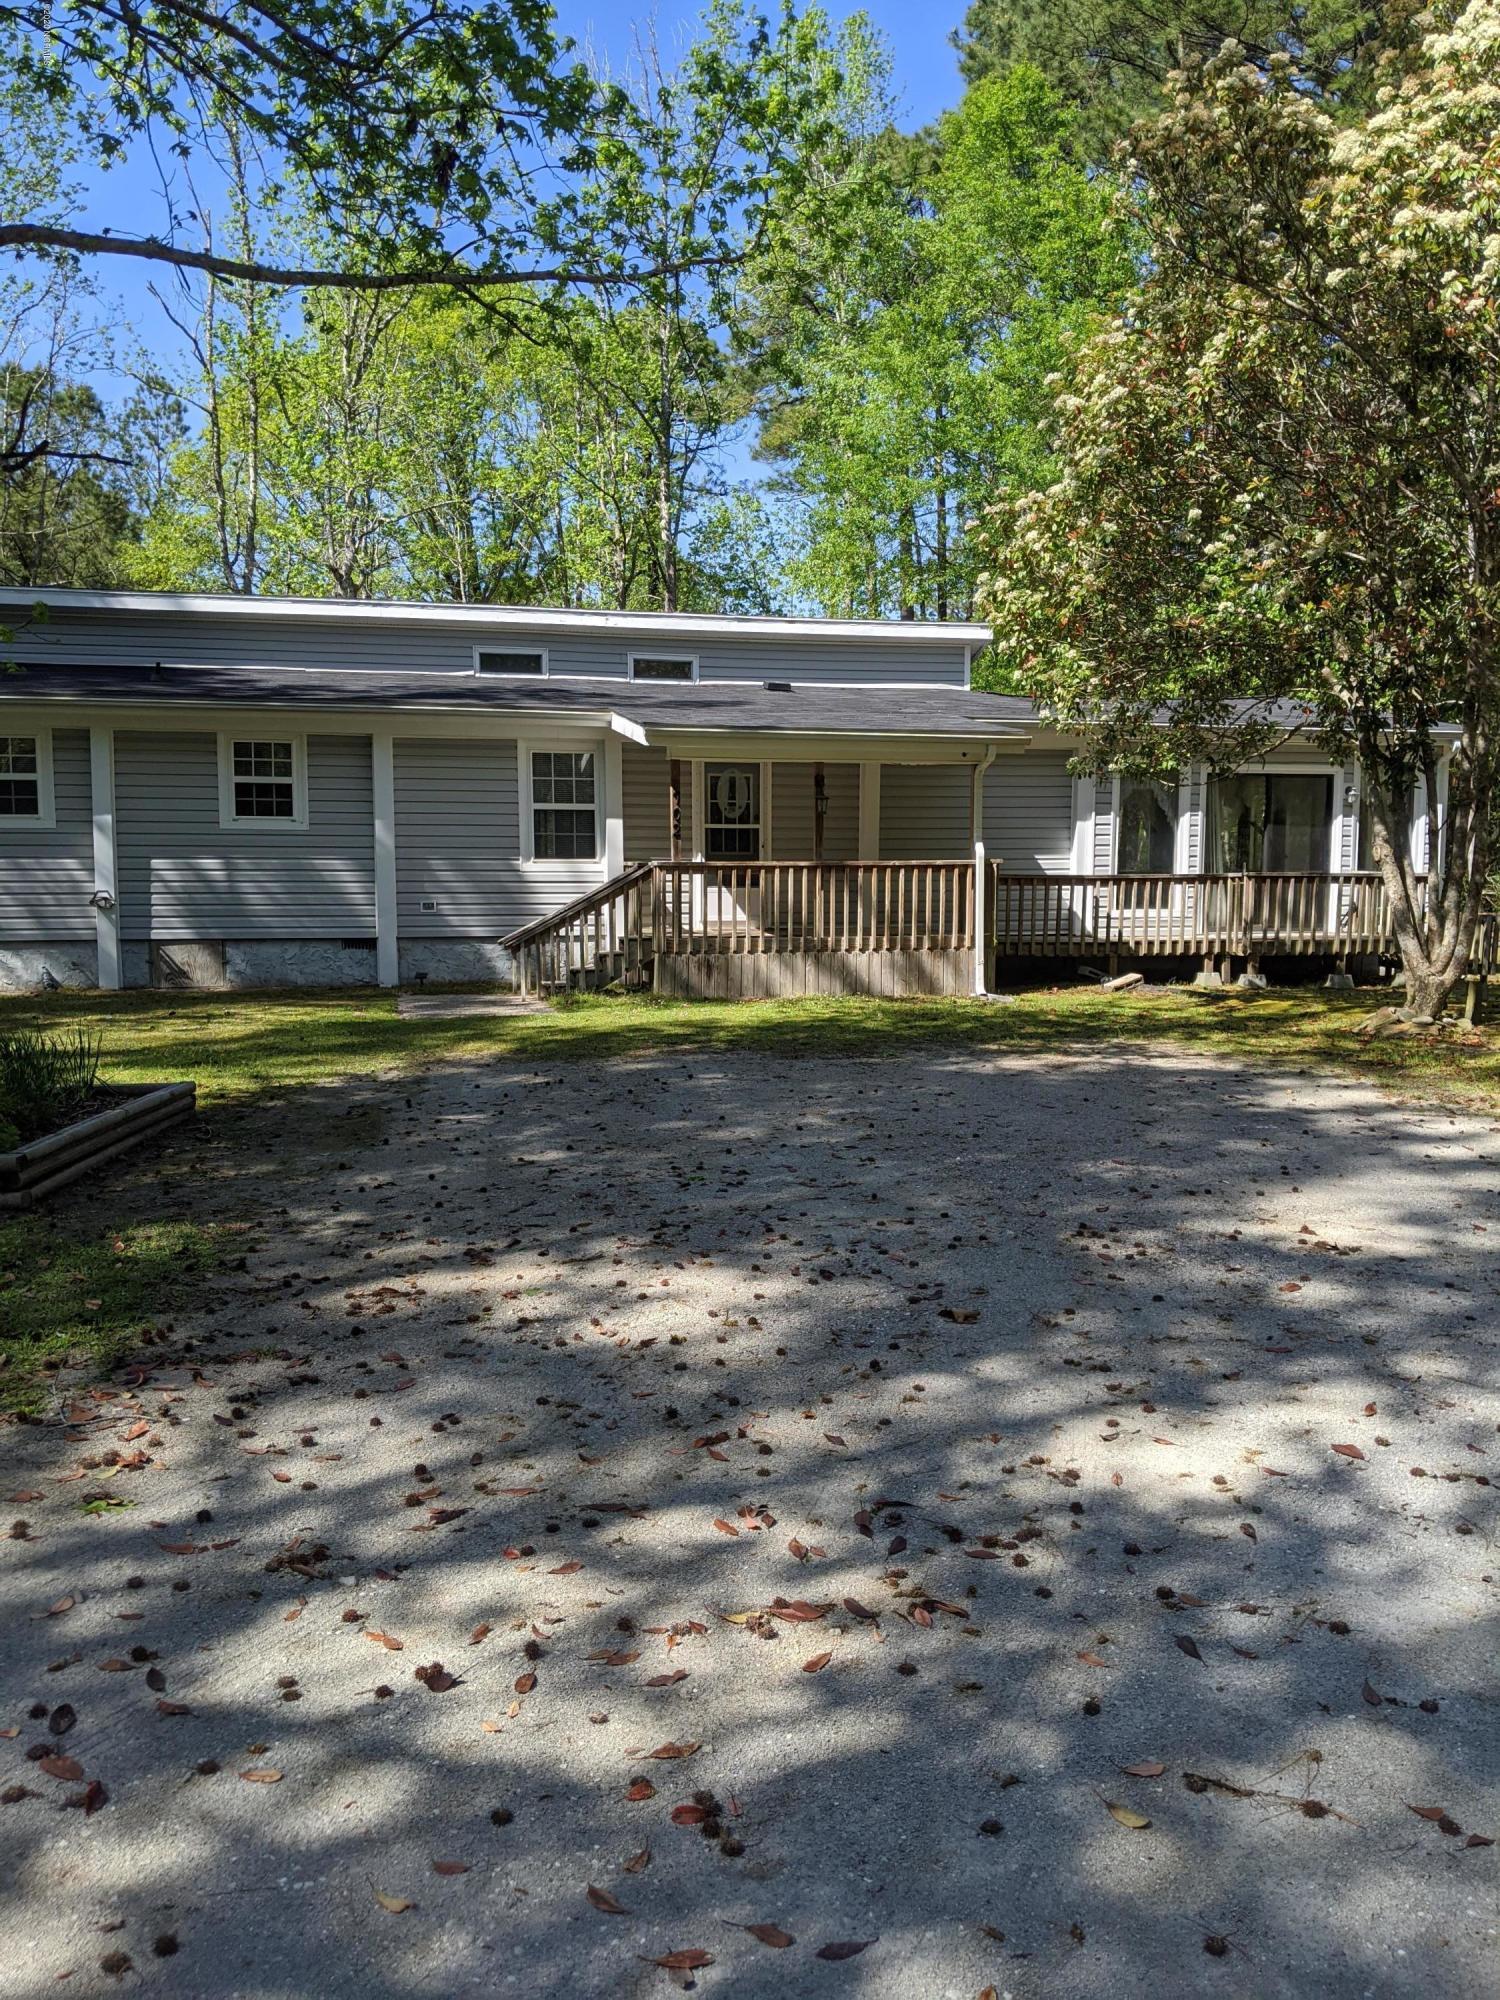 702 Swansboro Loop Road, Swansboro, North Carolina 28584, 3 Bedrooms Bedrooms, ,2 BathroomsBathrooms,Residential,For Sale,Swansboro Loop,100213385